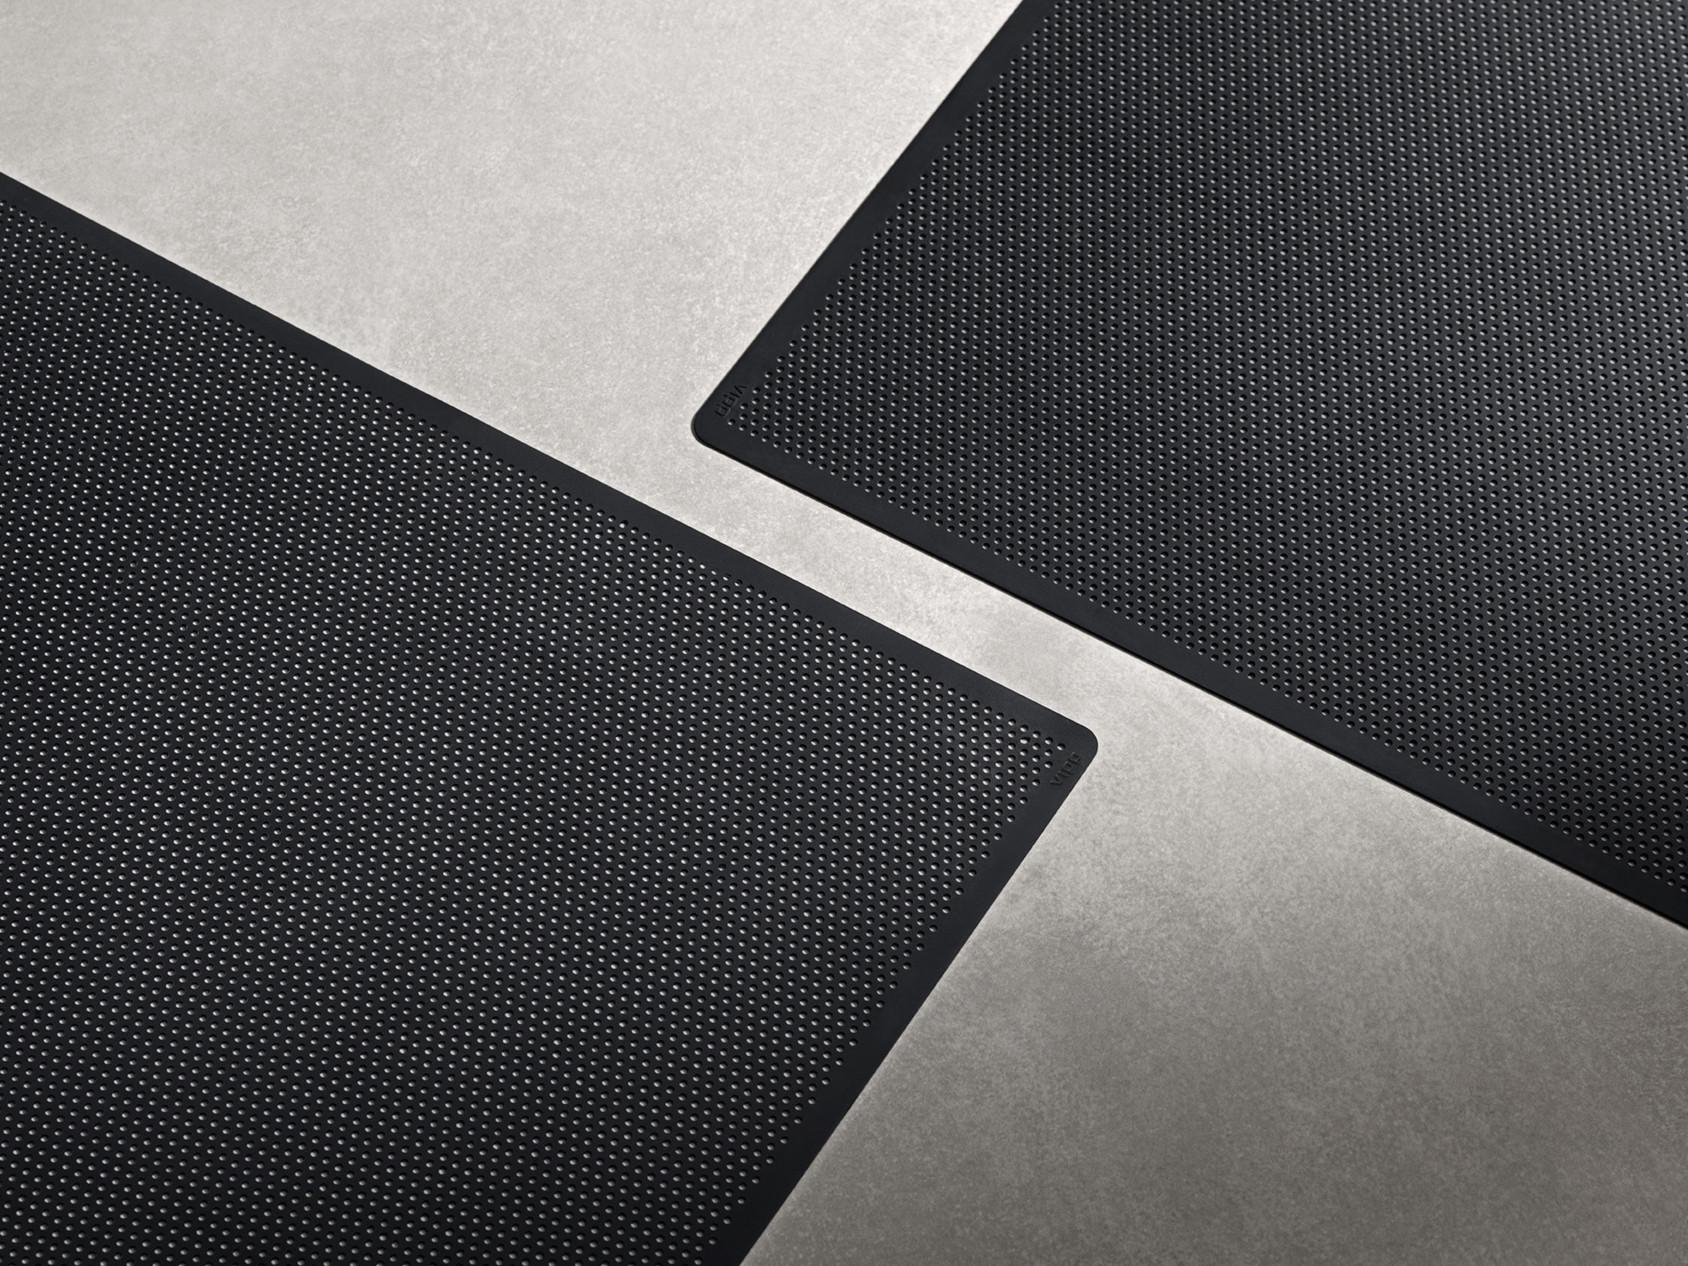 vipp Cloth Placemat Set VIPP130, 13004, 5705953000569